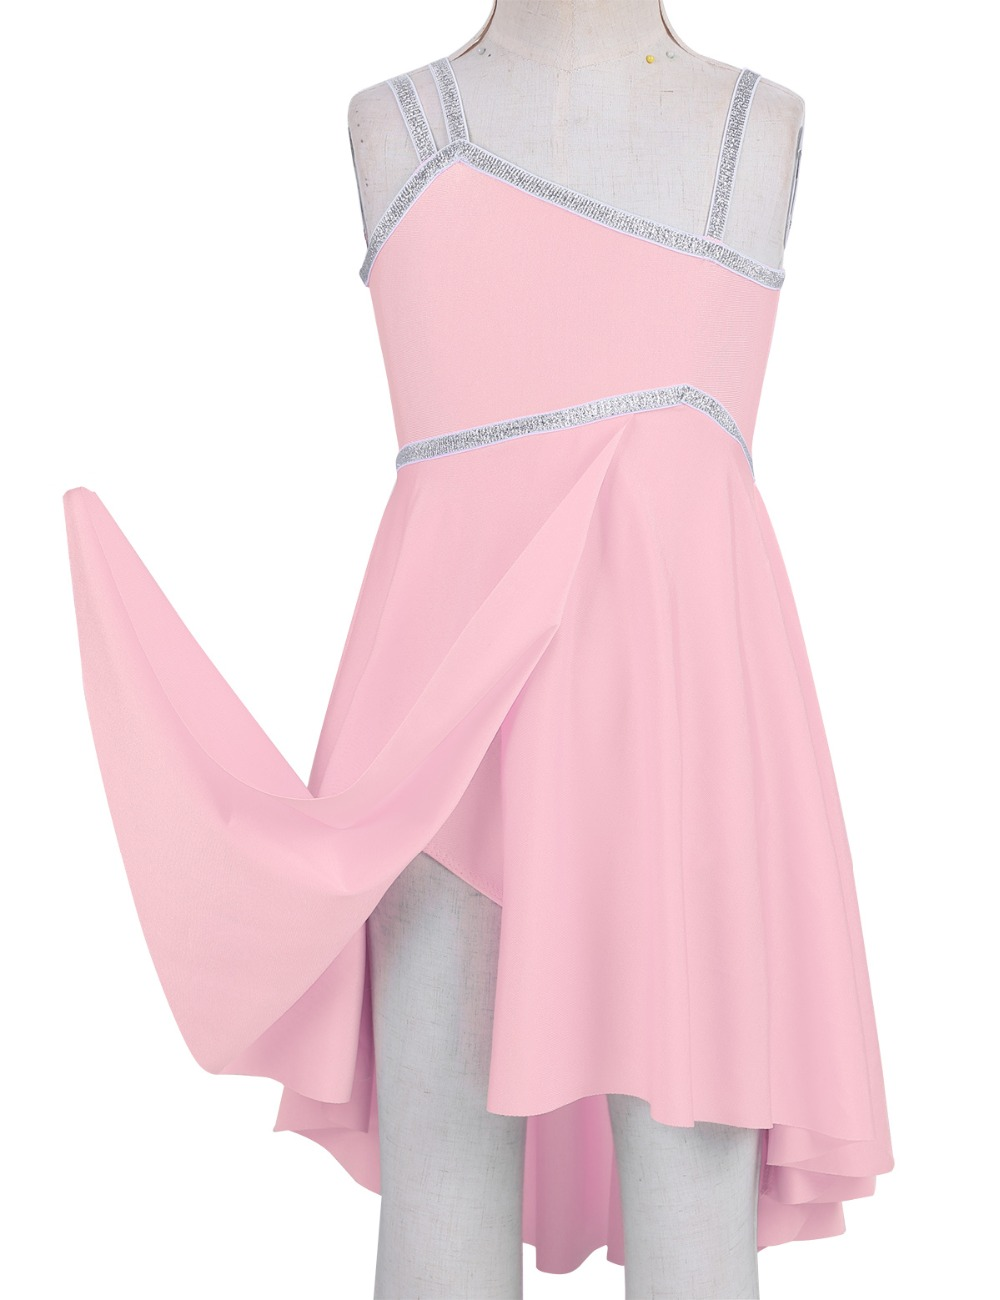 iixpin Kids Girls Shiny Sequins Stage Performance High-Low Hem Mesh Dress Ballet Dance Tutu Skirt Ballerina